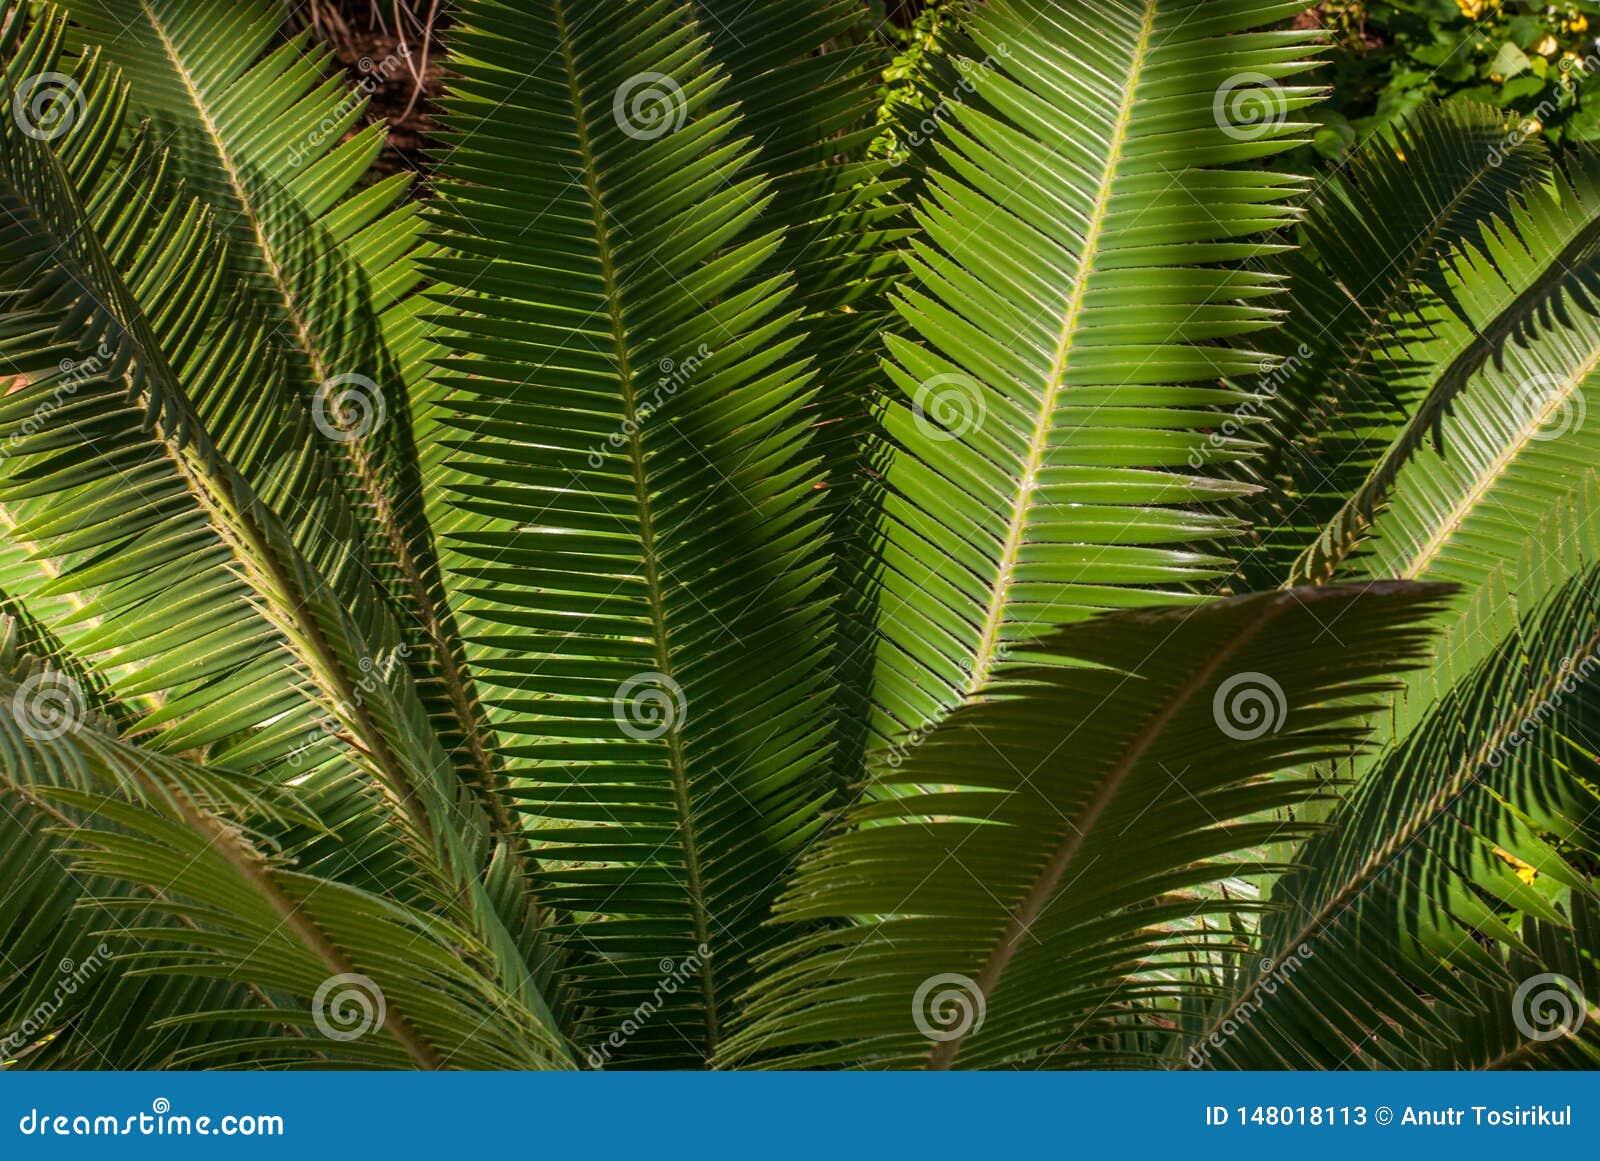 Teosinte Dioon palmowi mejiae, wielokrotno?? ro?liny